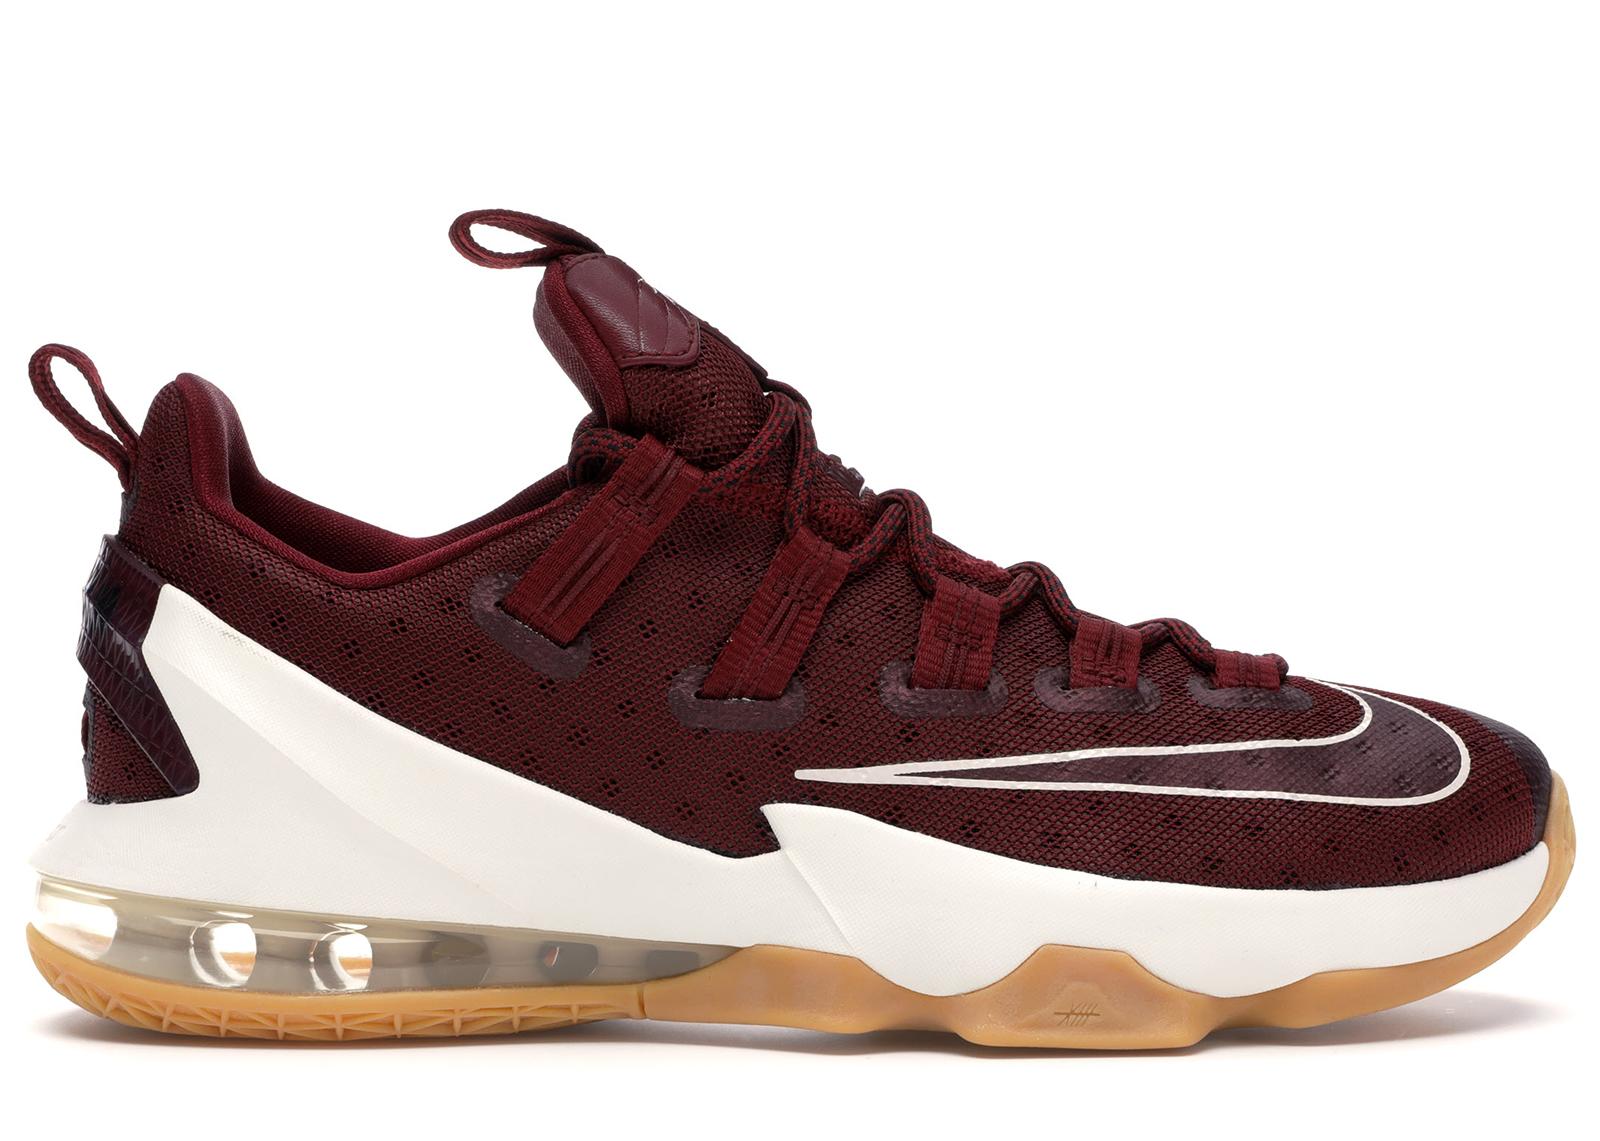 Nike LeBron 13 Low Cavs - 831925-610